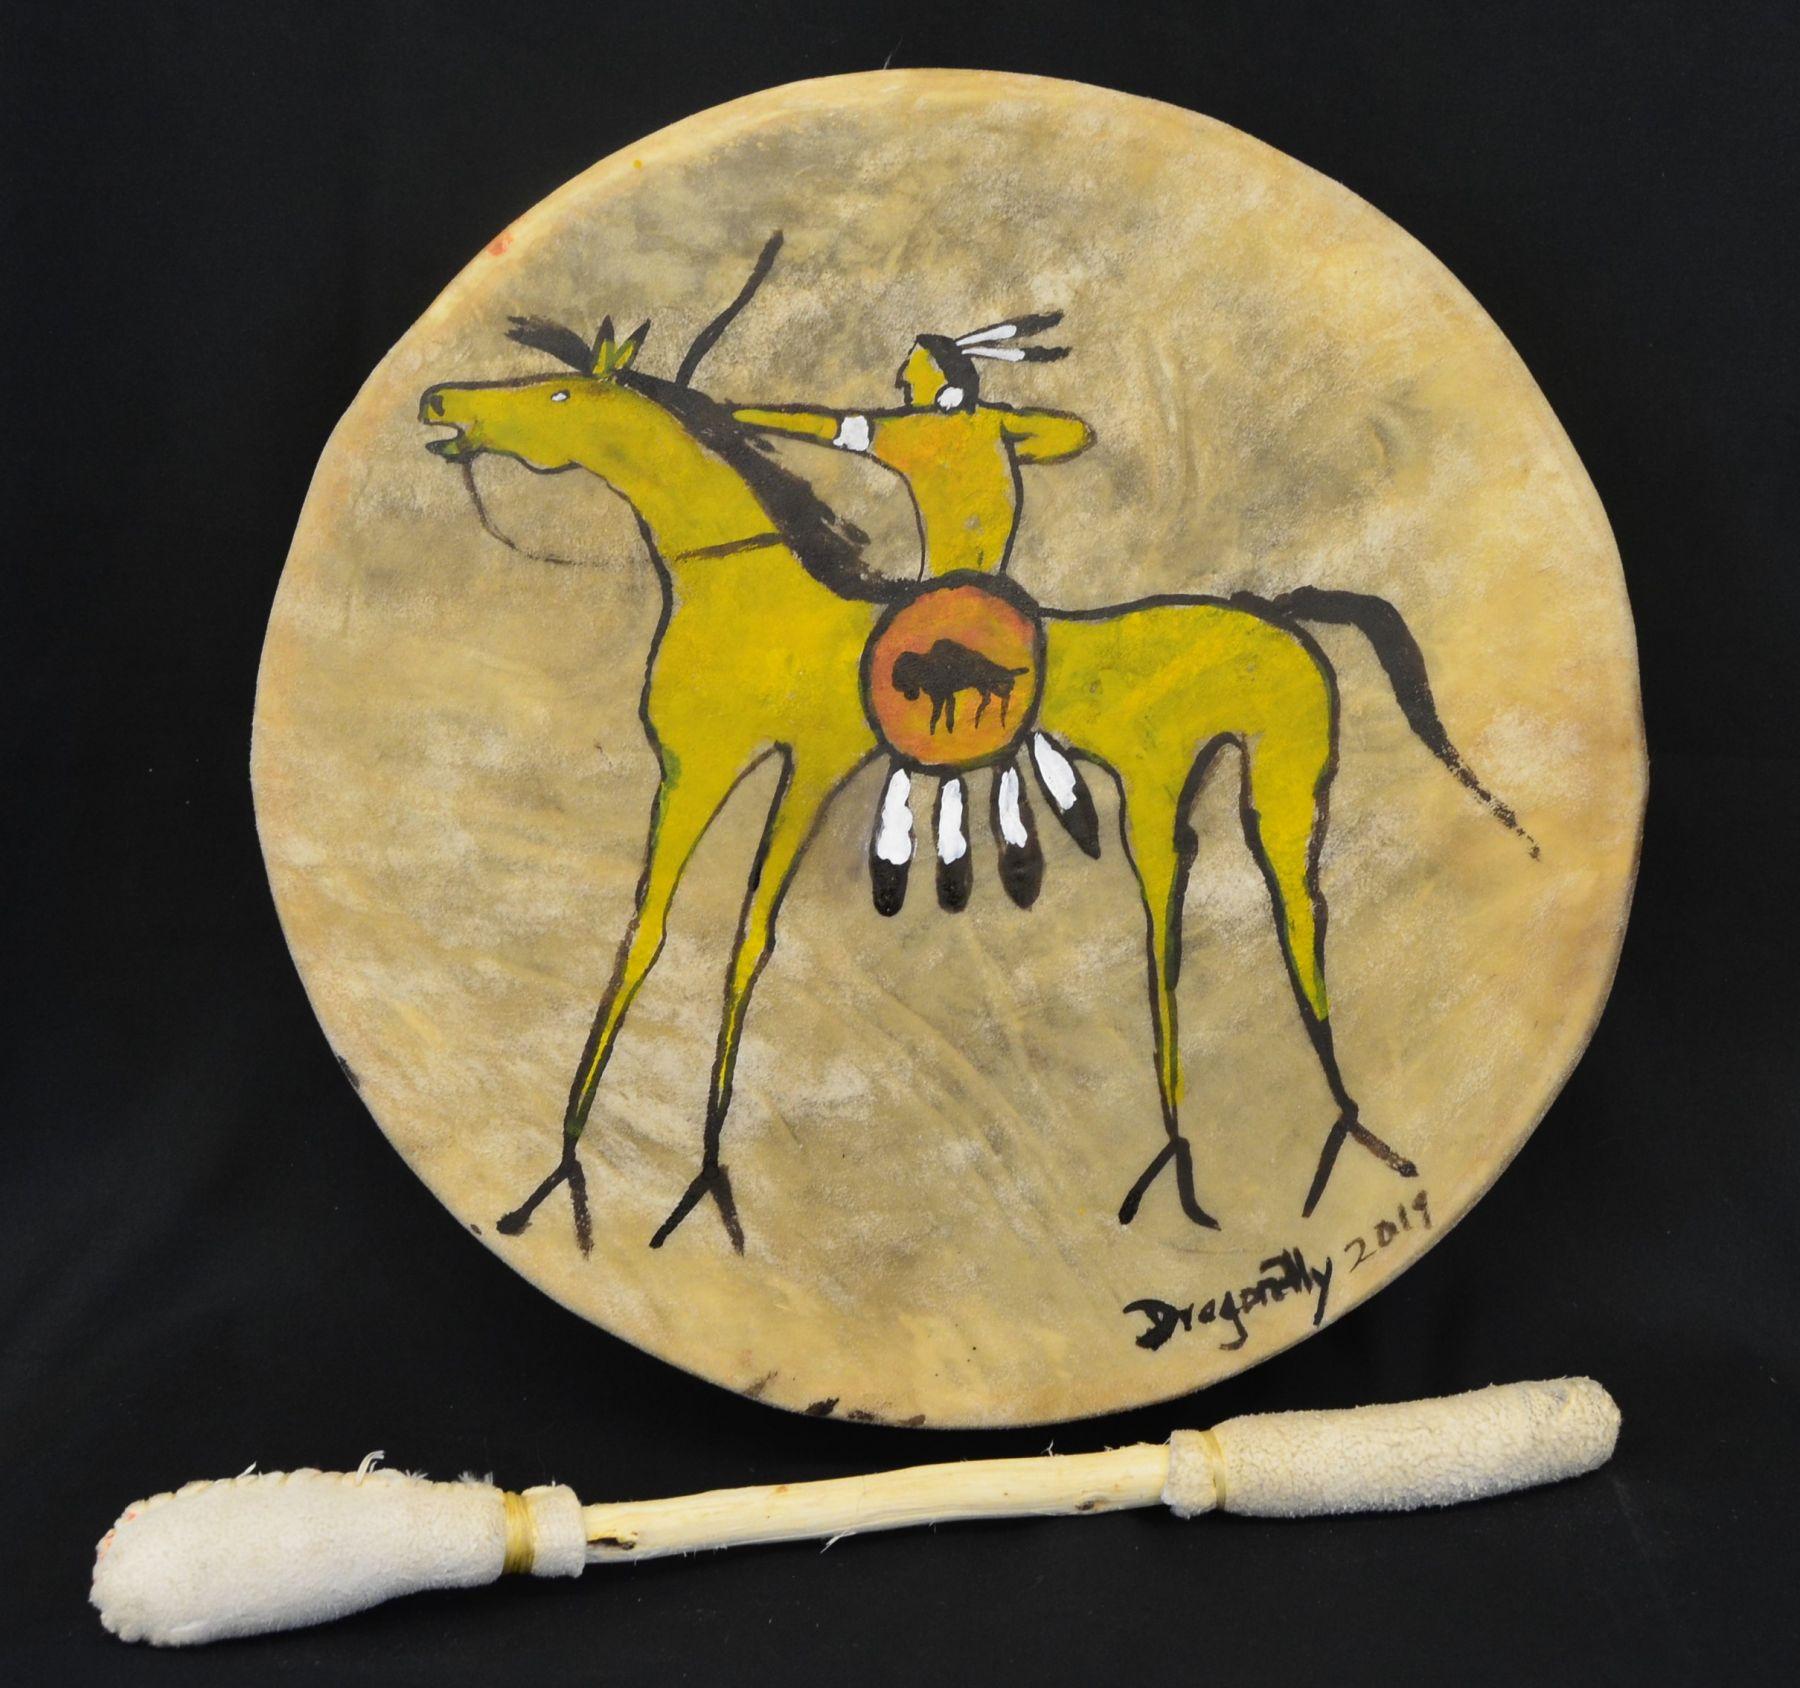 Estuki-Mahtsis drum